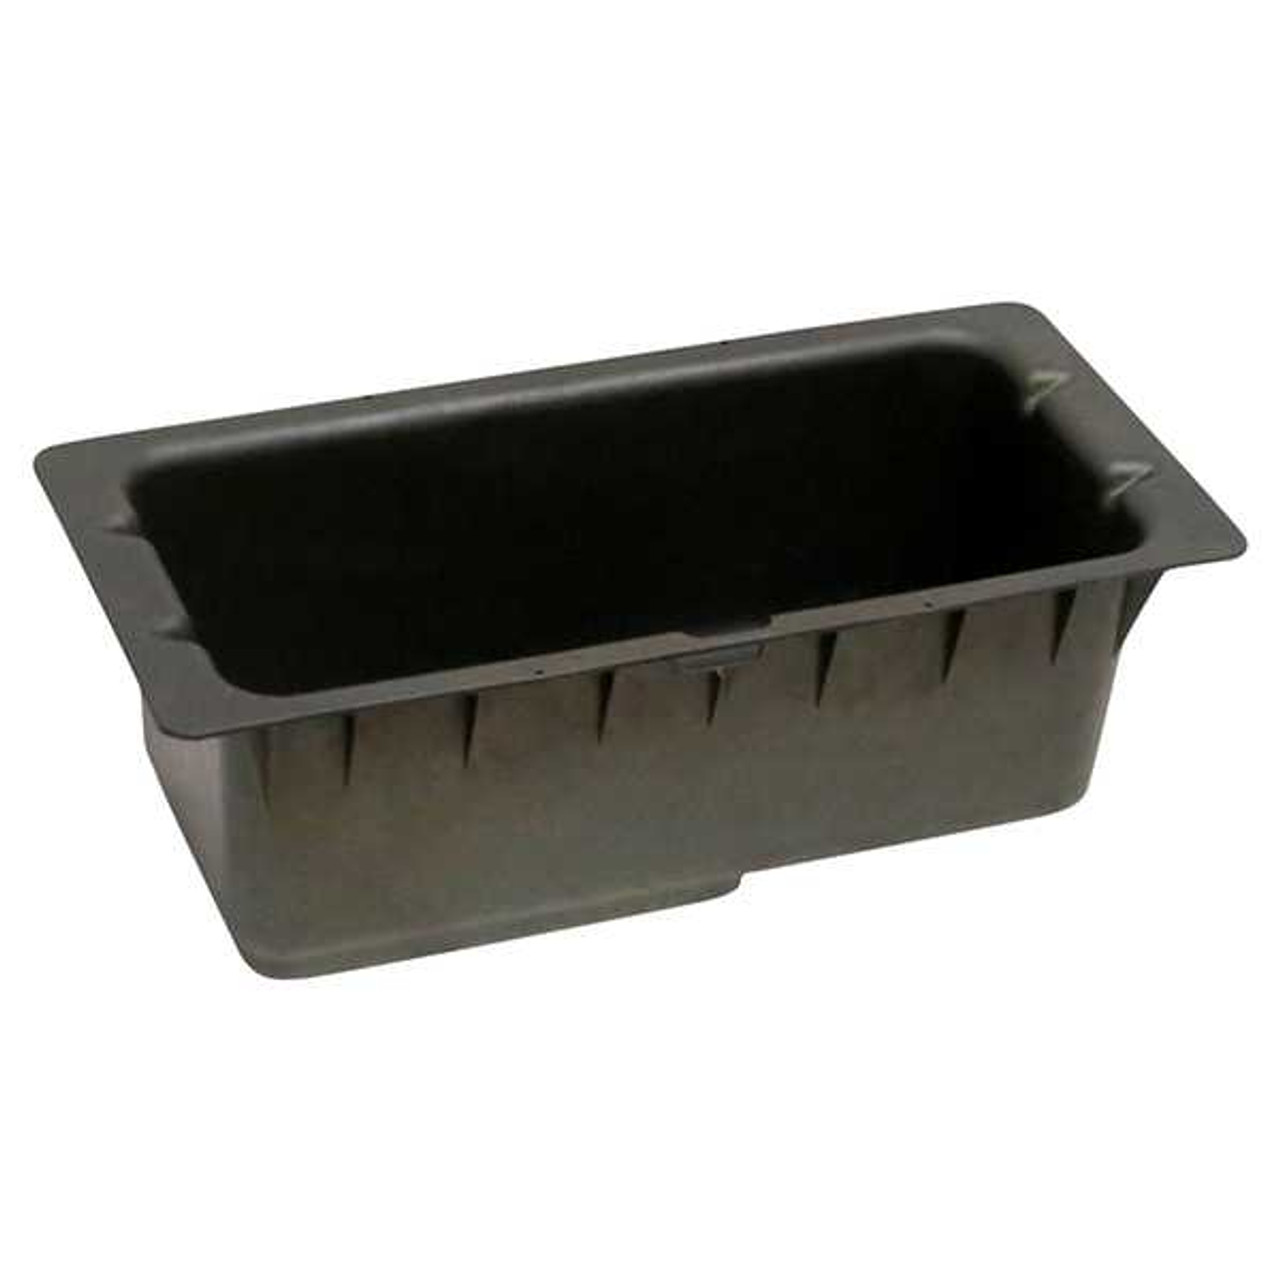 RHOX Underseat Storage Box for RHOX 500 Series Rear Seats